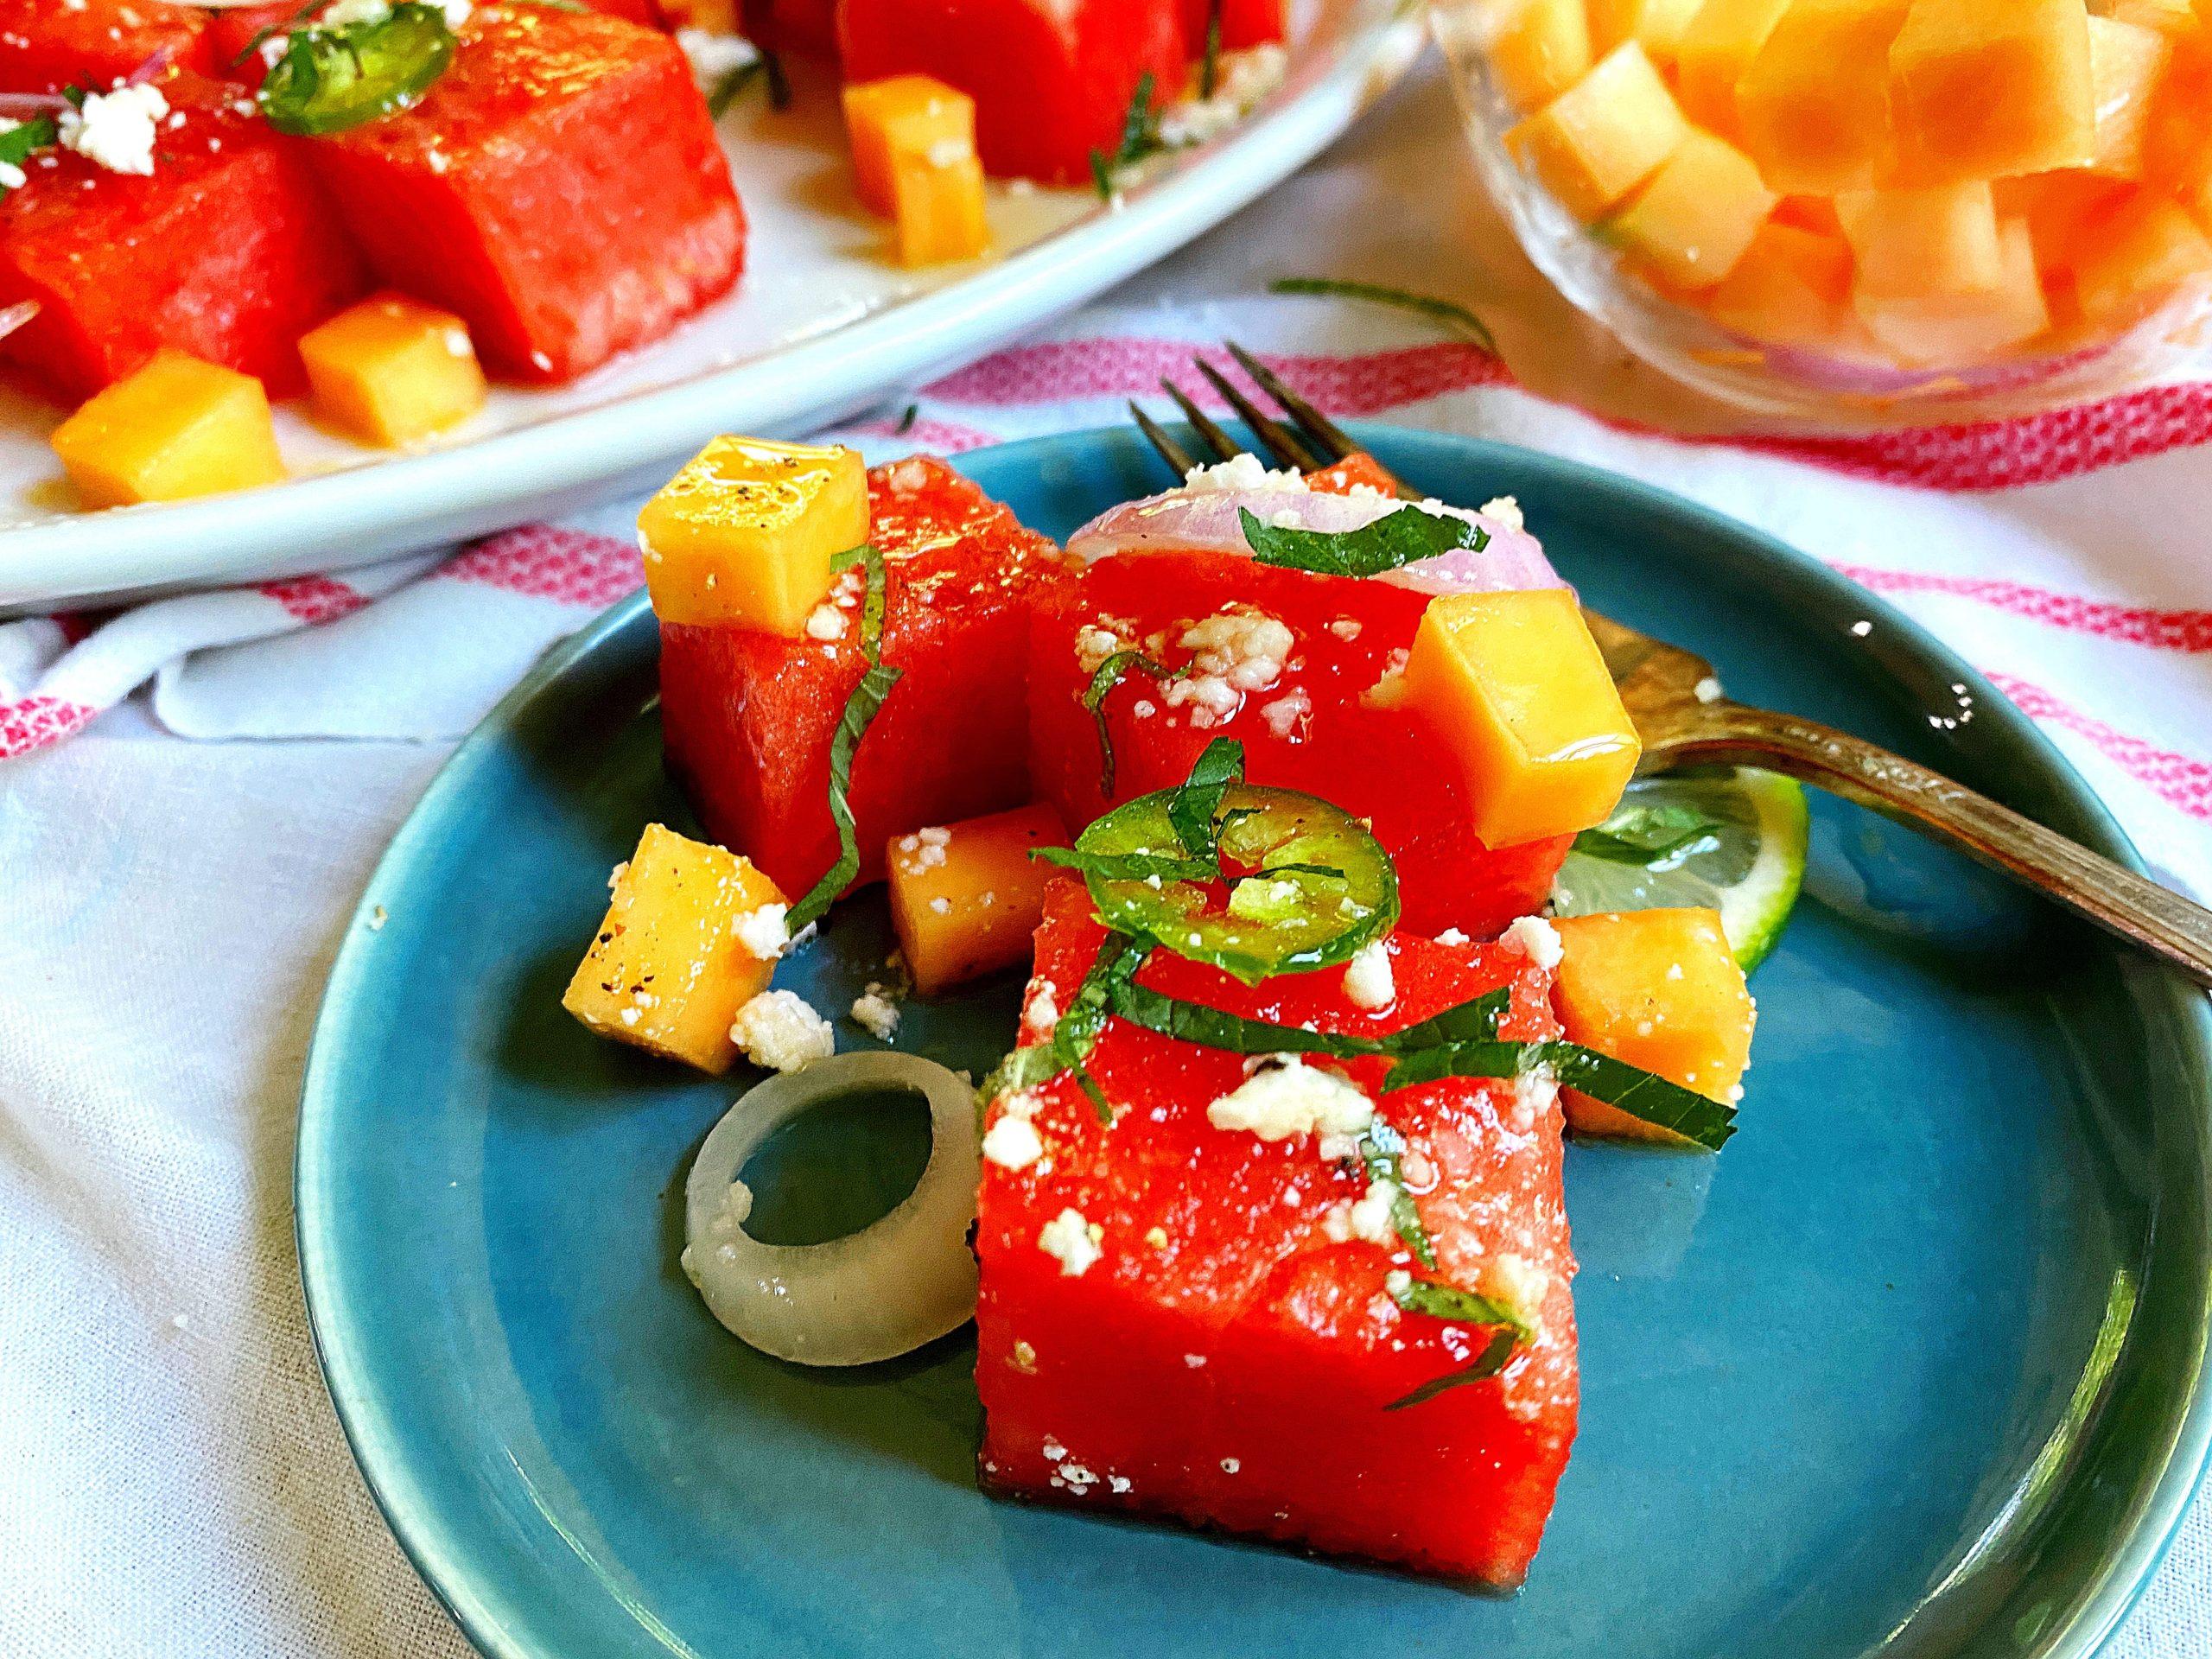 Mojito Melon Summer salad served